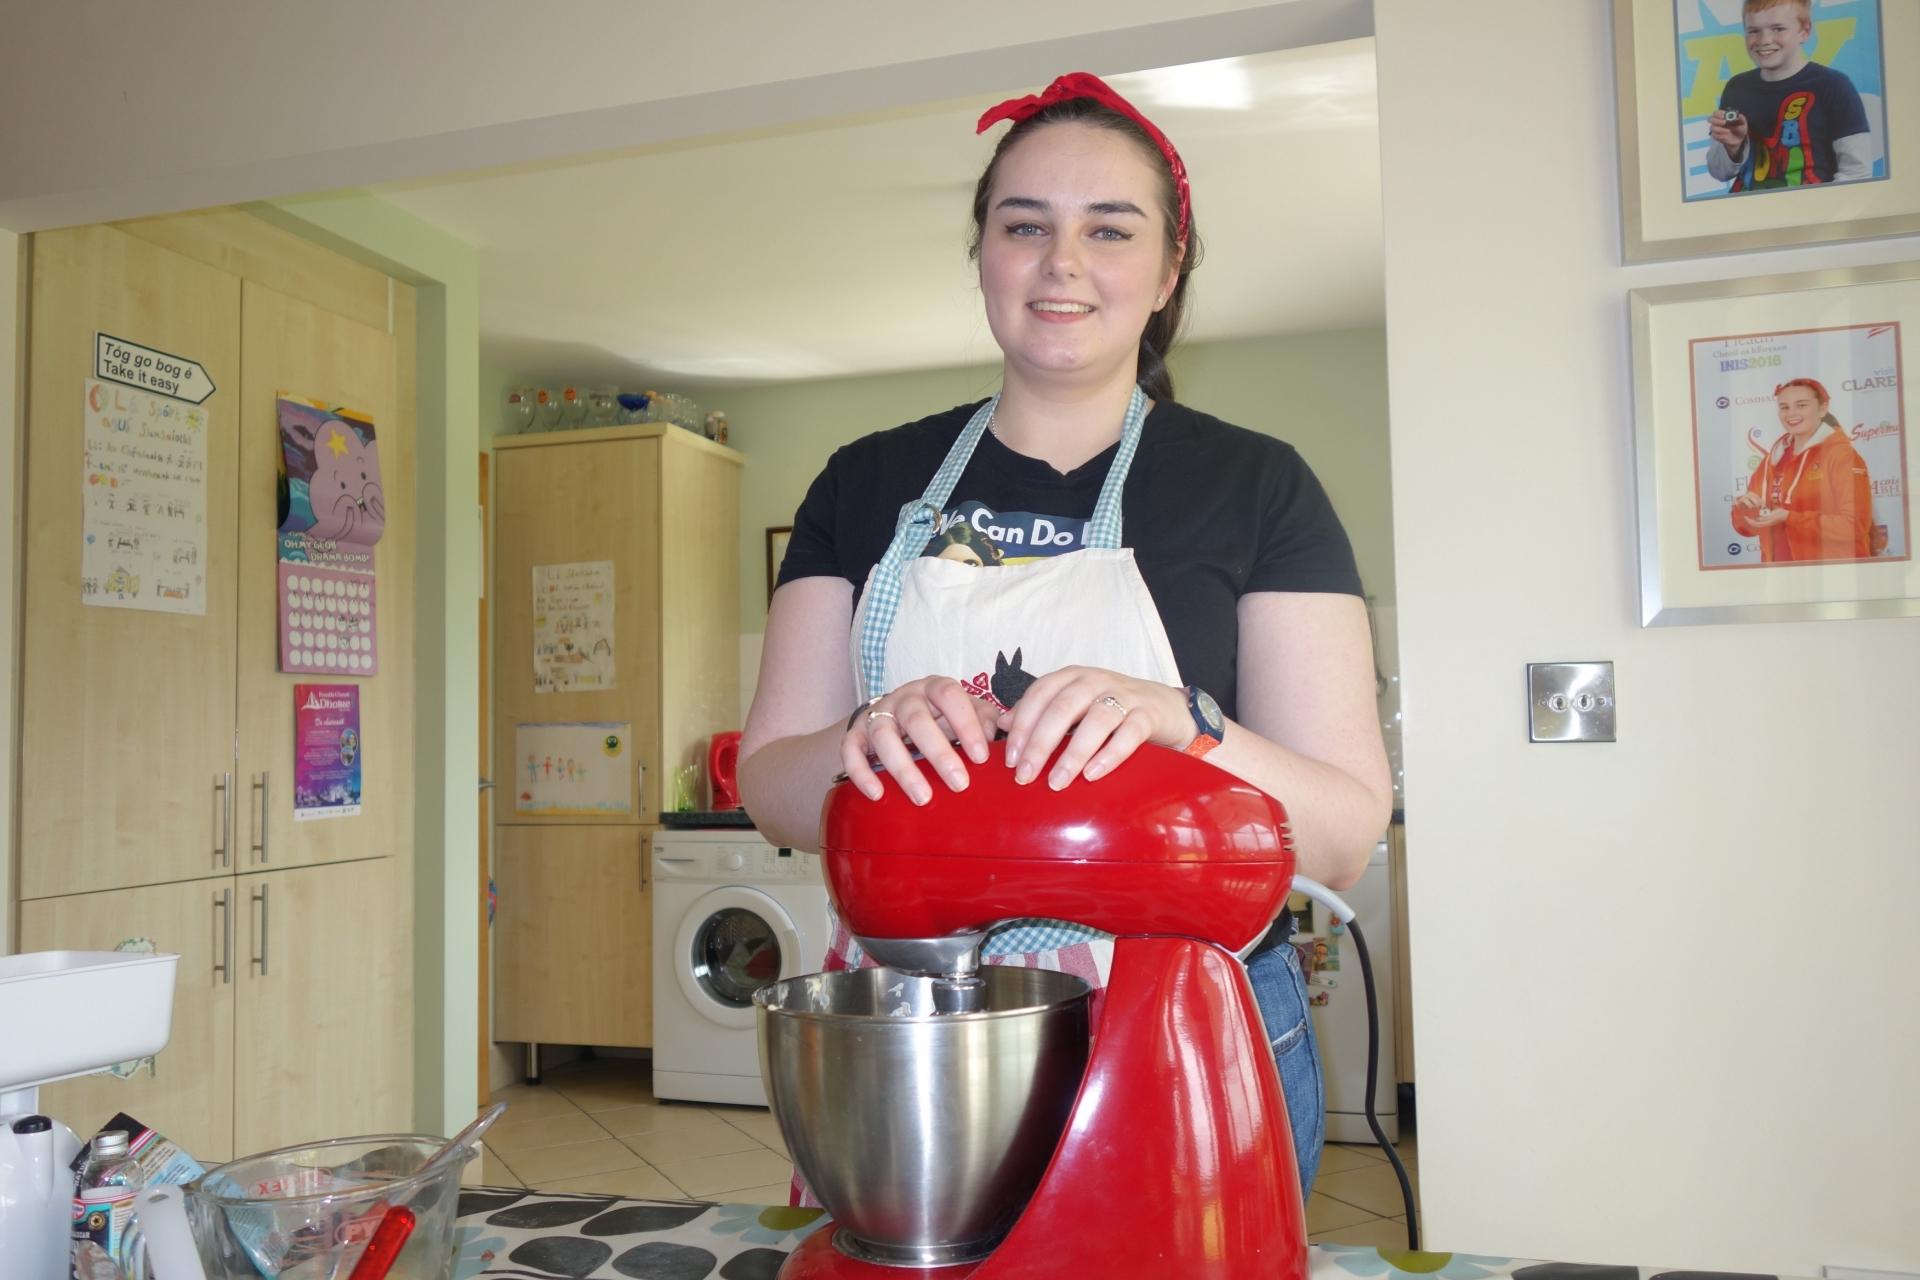 Cait Ní Cheallaigh baking at home